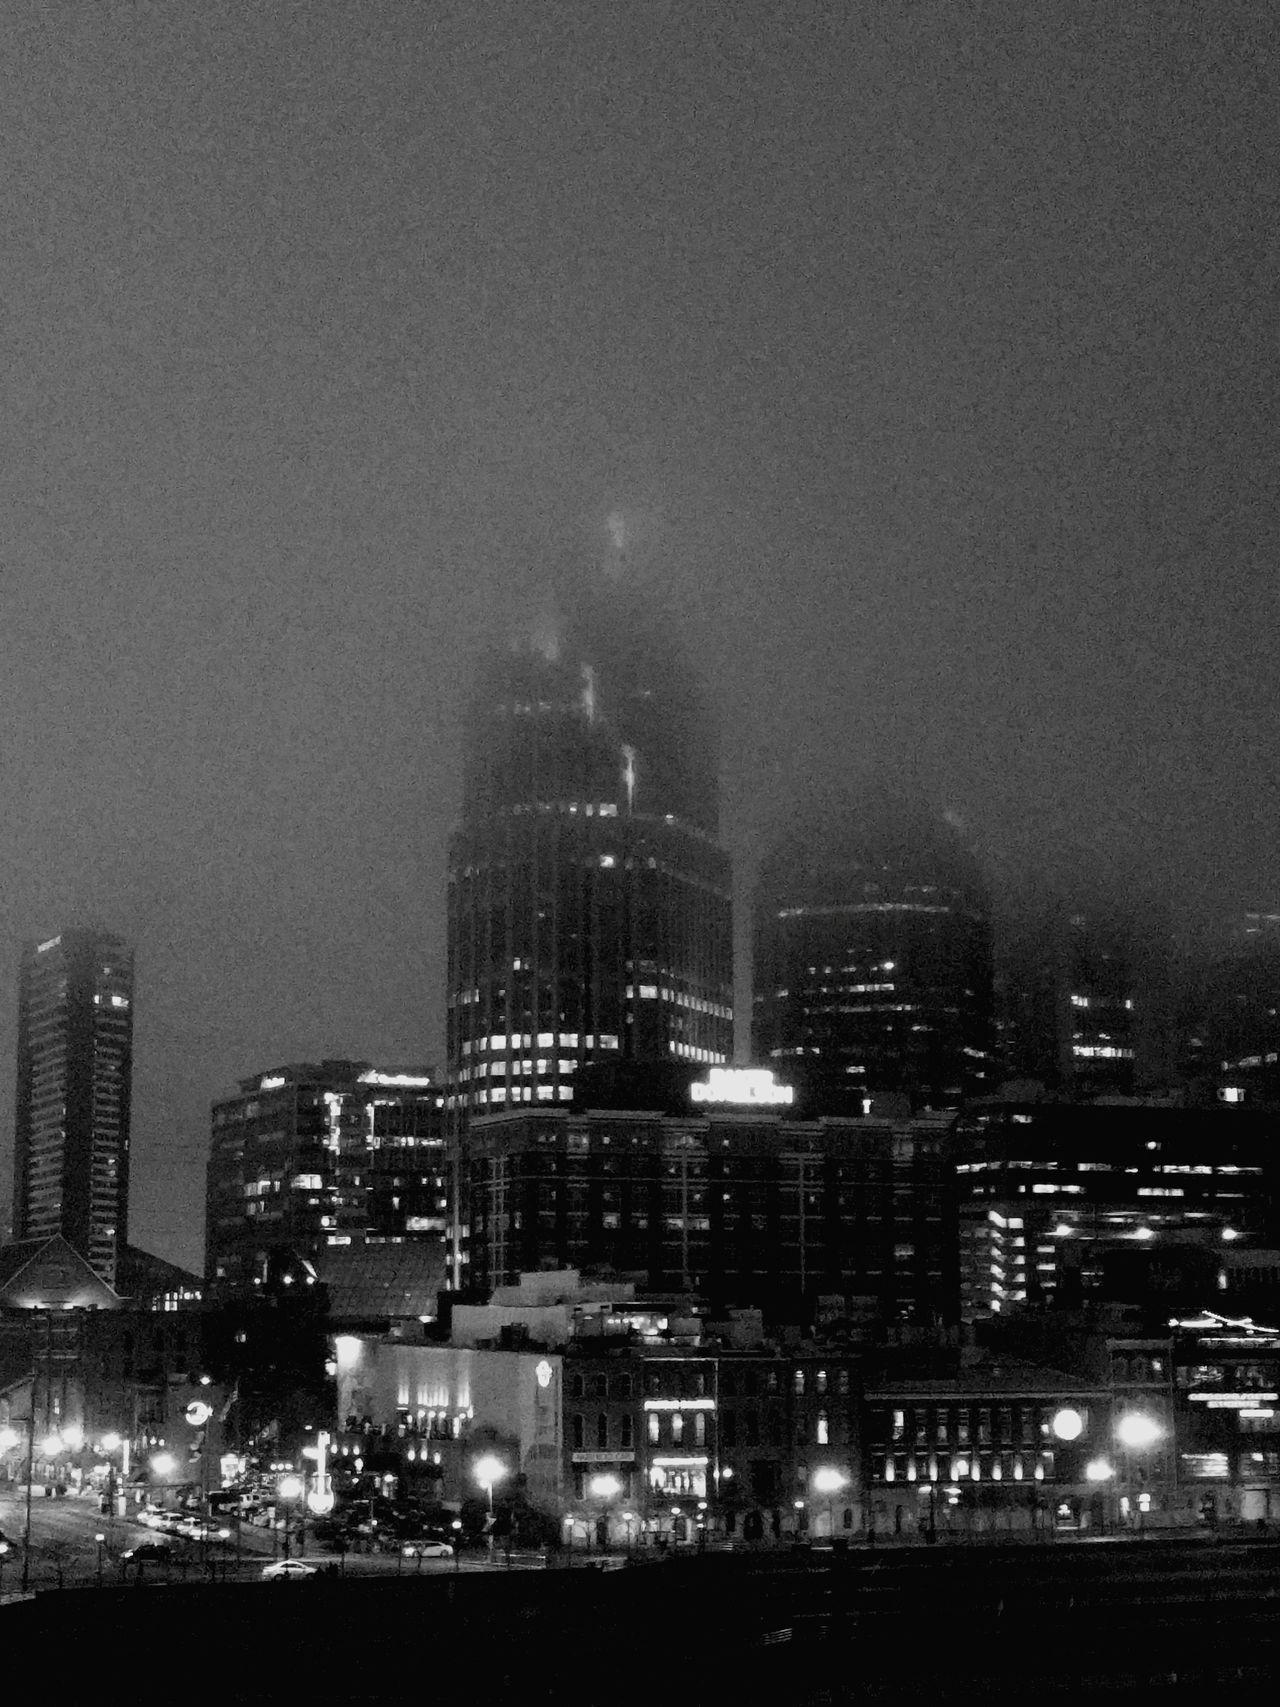 City Night Skyscraper Cityscape Sky Fog NASHVILLE,TENNESSEE Nashville Foggy Night Fog City Cold Temperature Urban Skyline